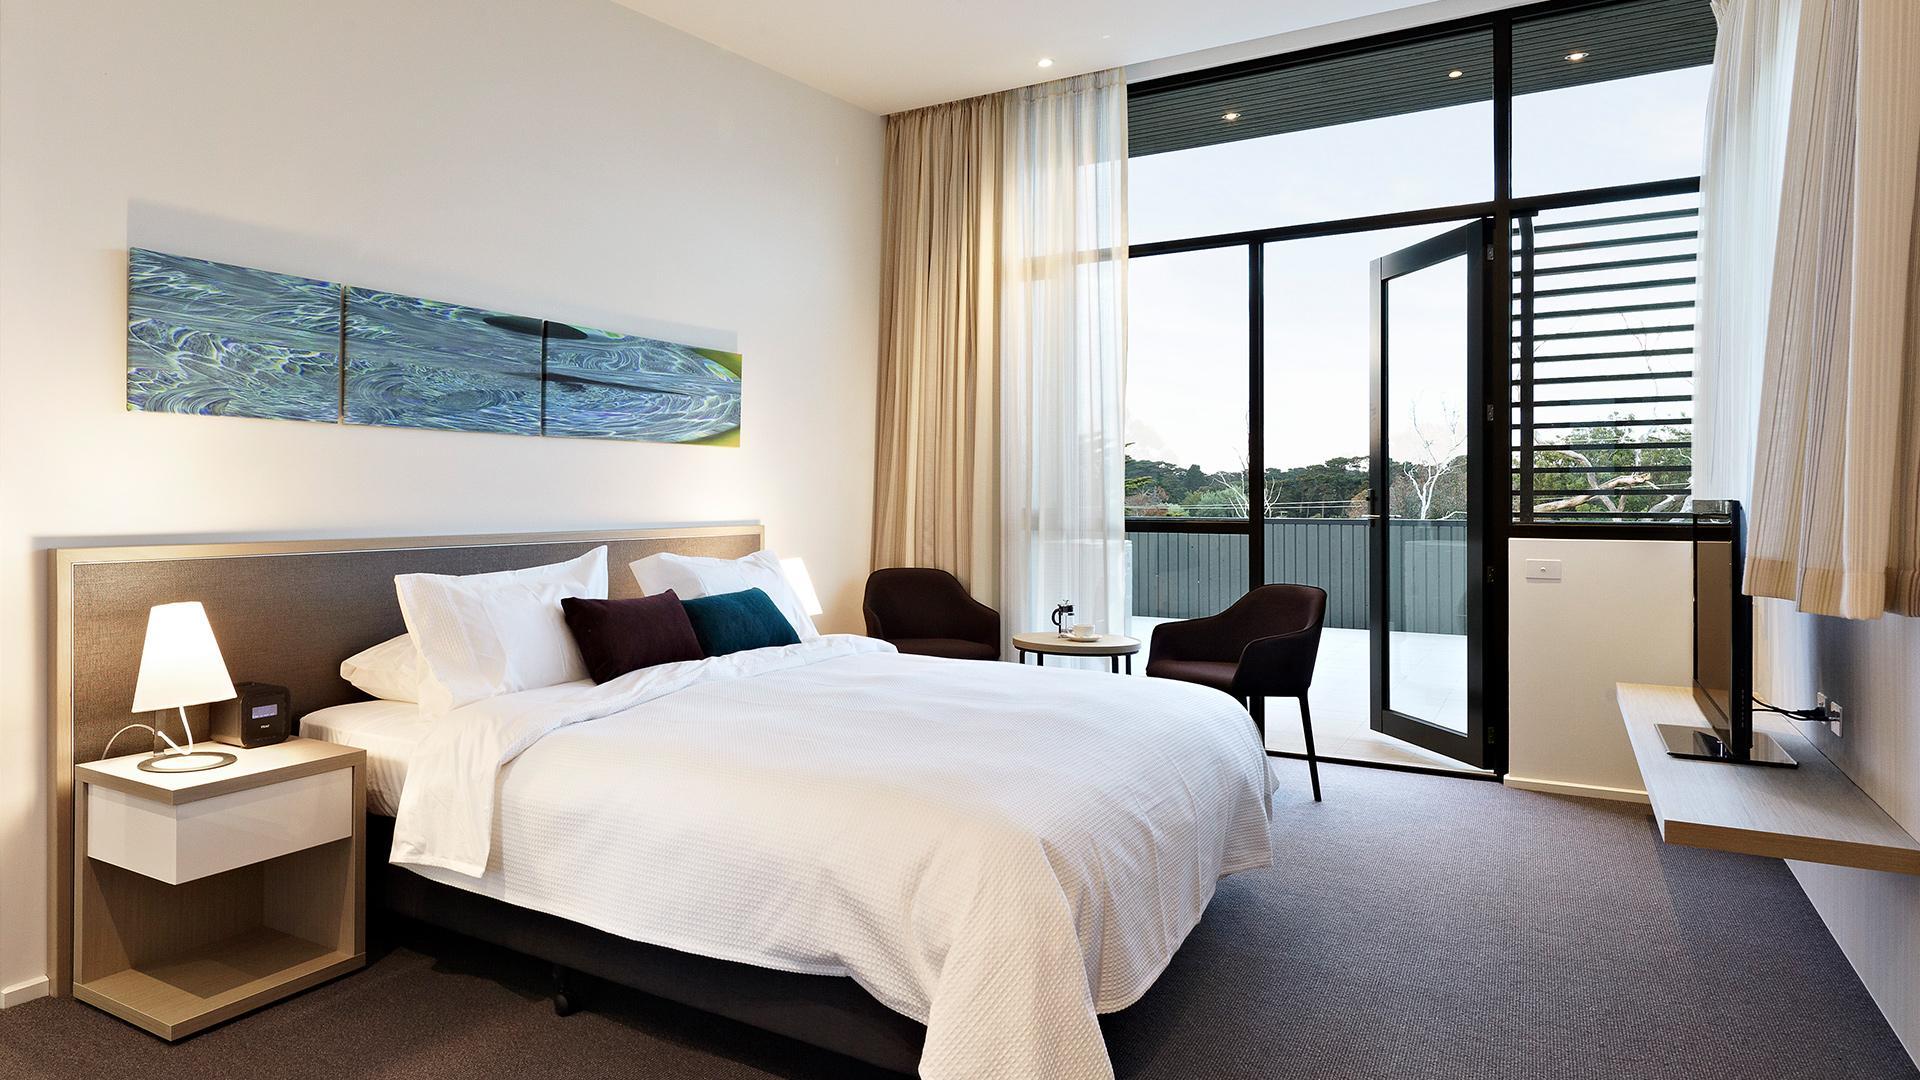 Flinders Room image 1 at Quarters at Flinders Hotel by Shire of Mornington Peninsula, Victoria, Australia